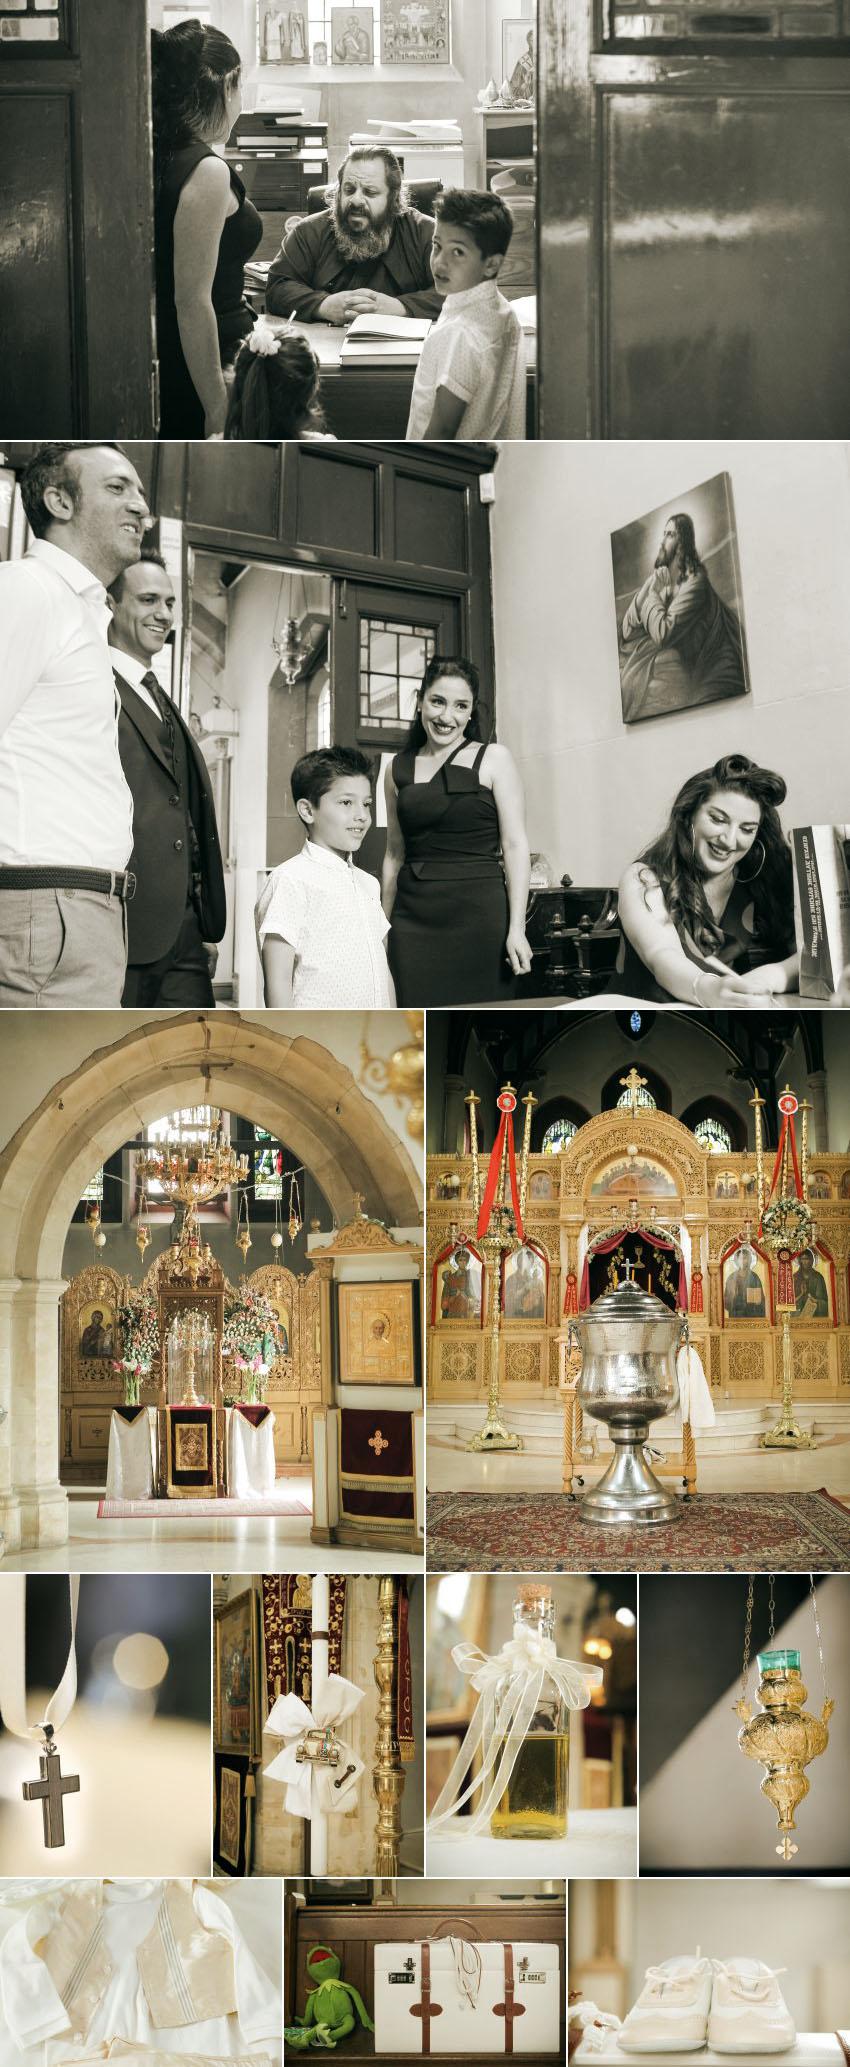 An orthodox Christening at St Demetrios Greek Church